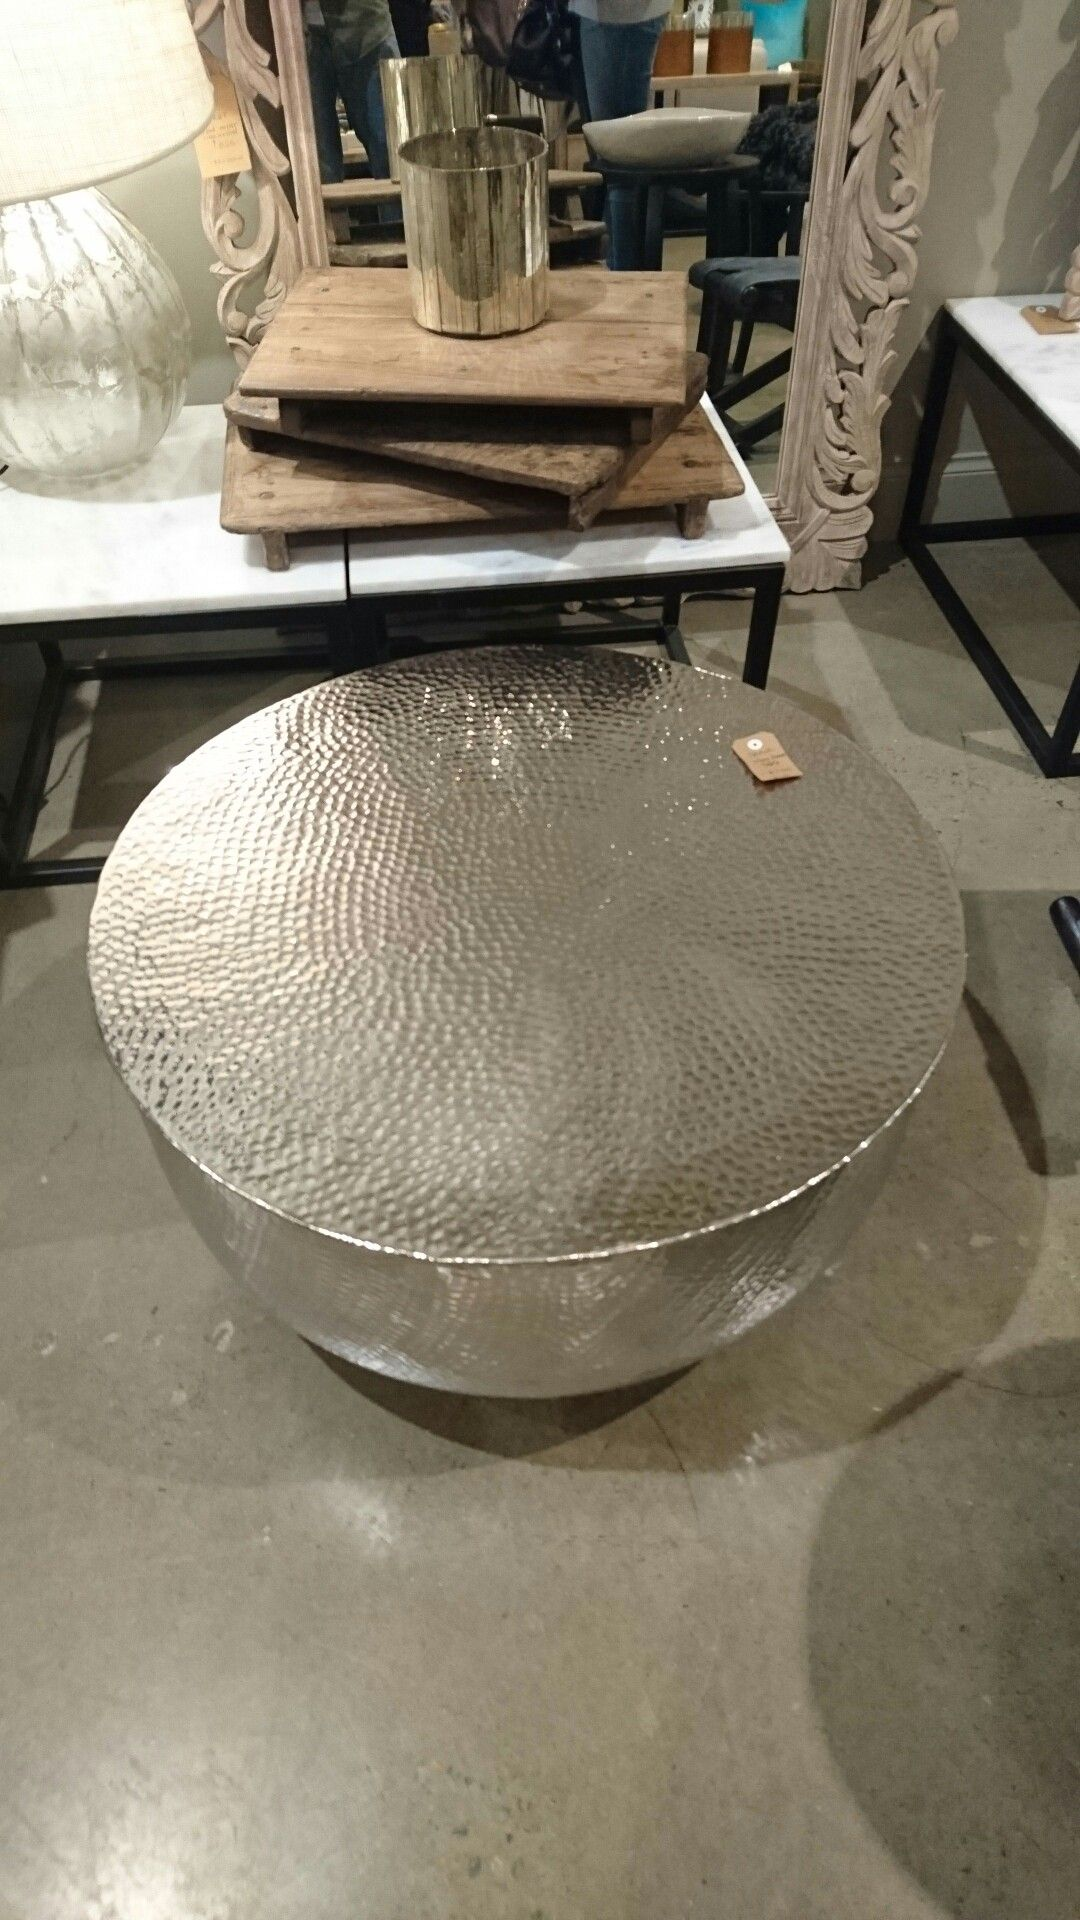 Silver Drum Coffee Table Modern Moroccan Decor Drum Coffee Table Coffee Table [ 1920 x 1080 Pixel ]